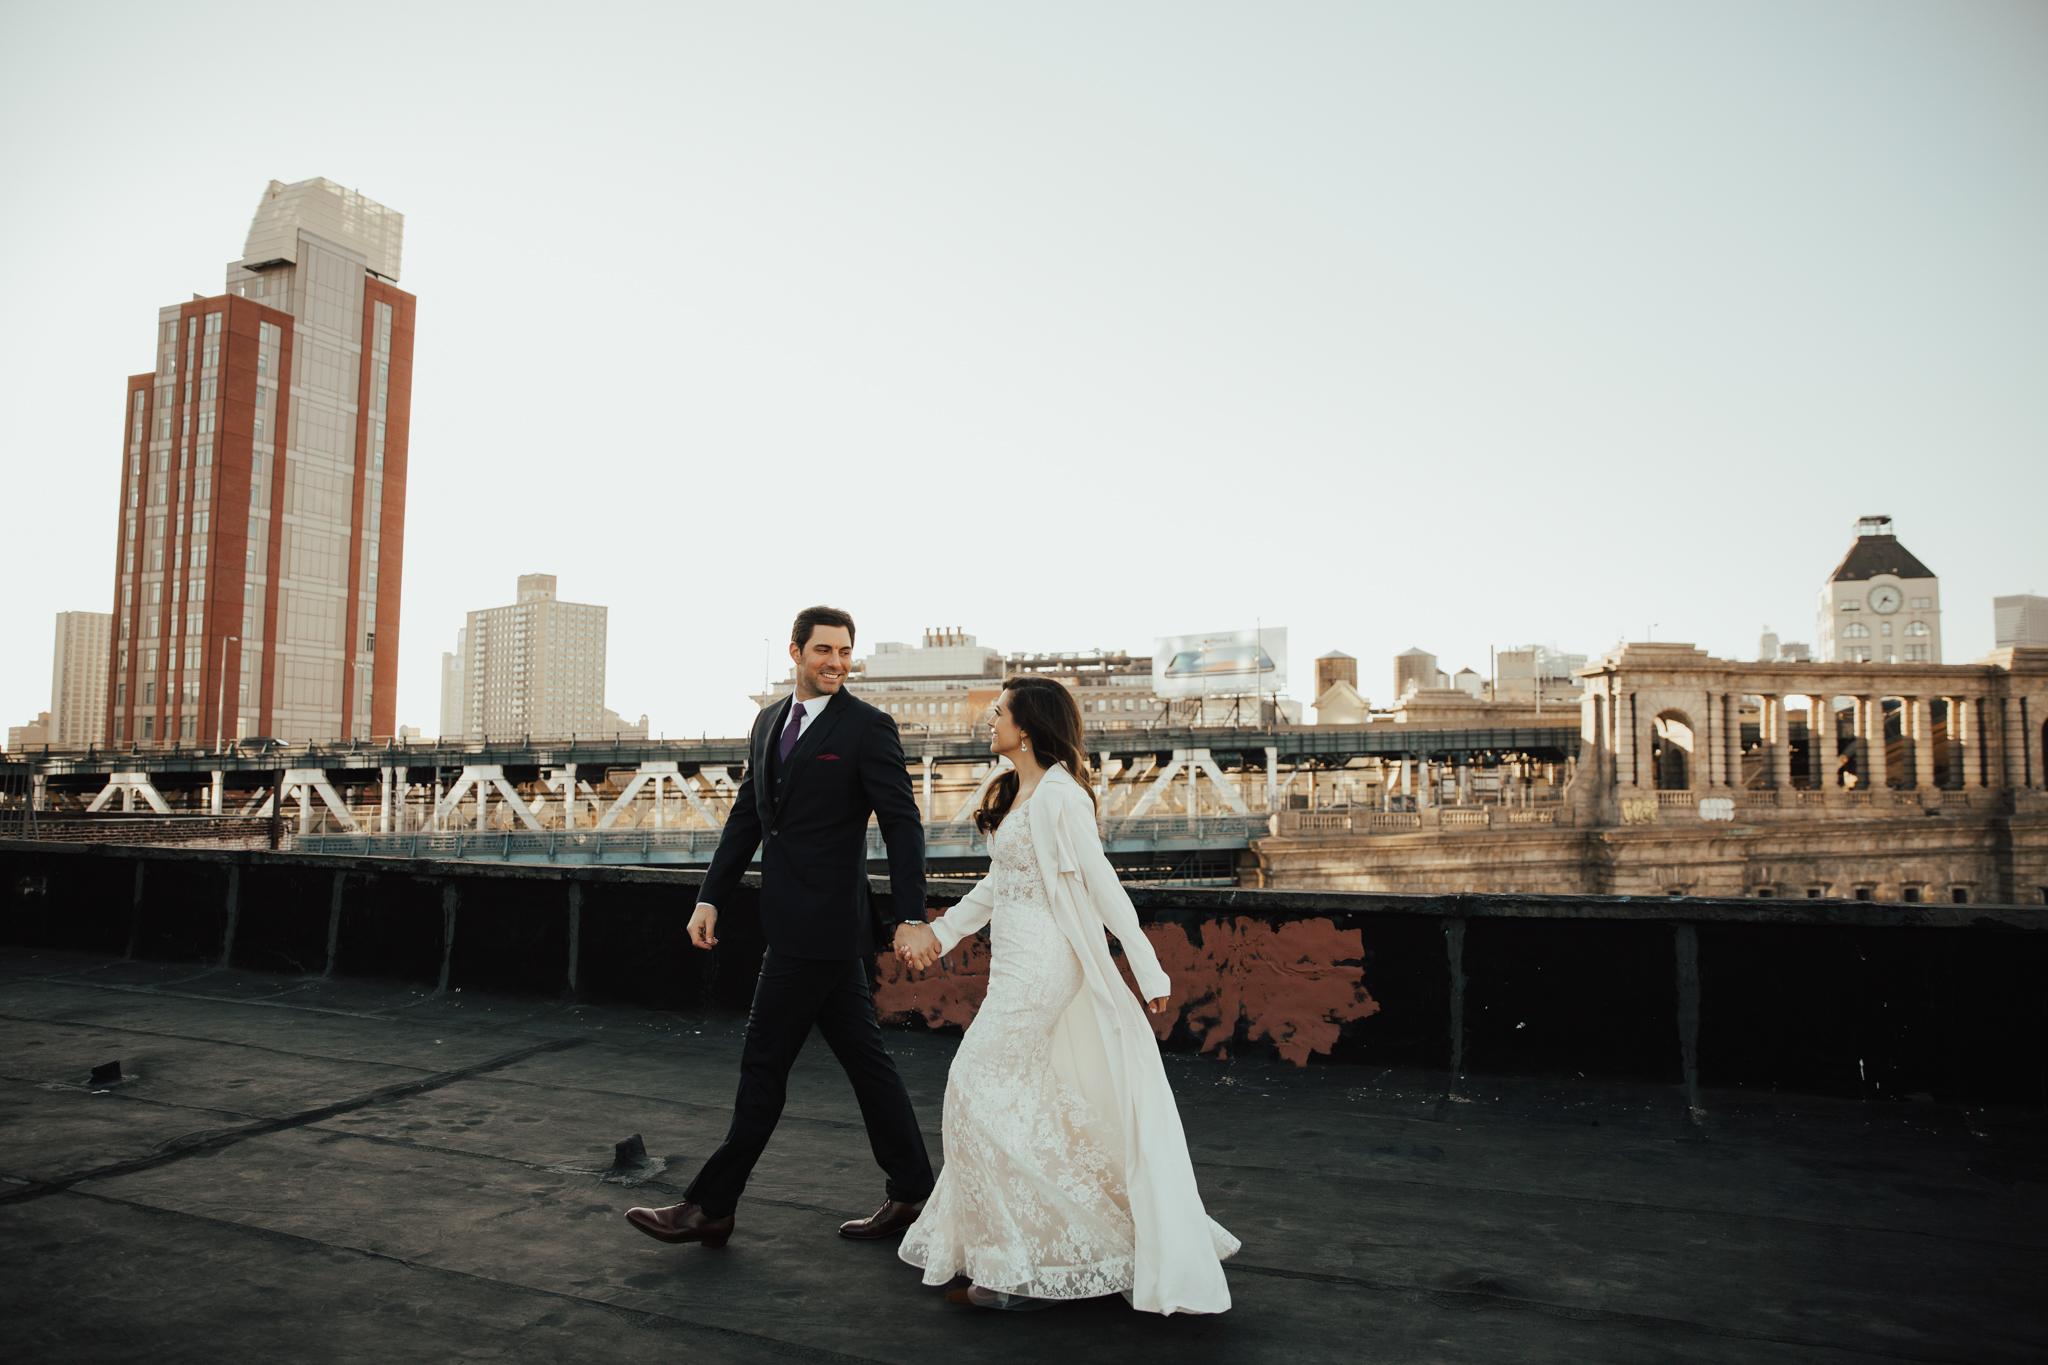 Intimate romantic ny wedding photographer